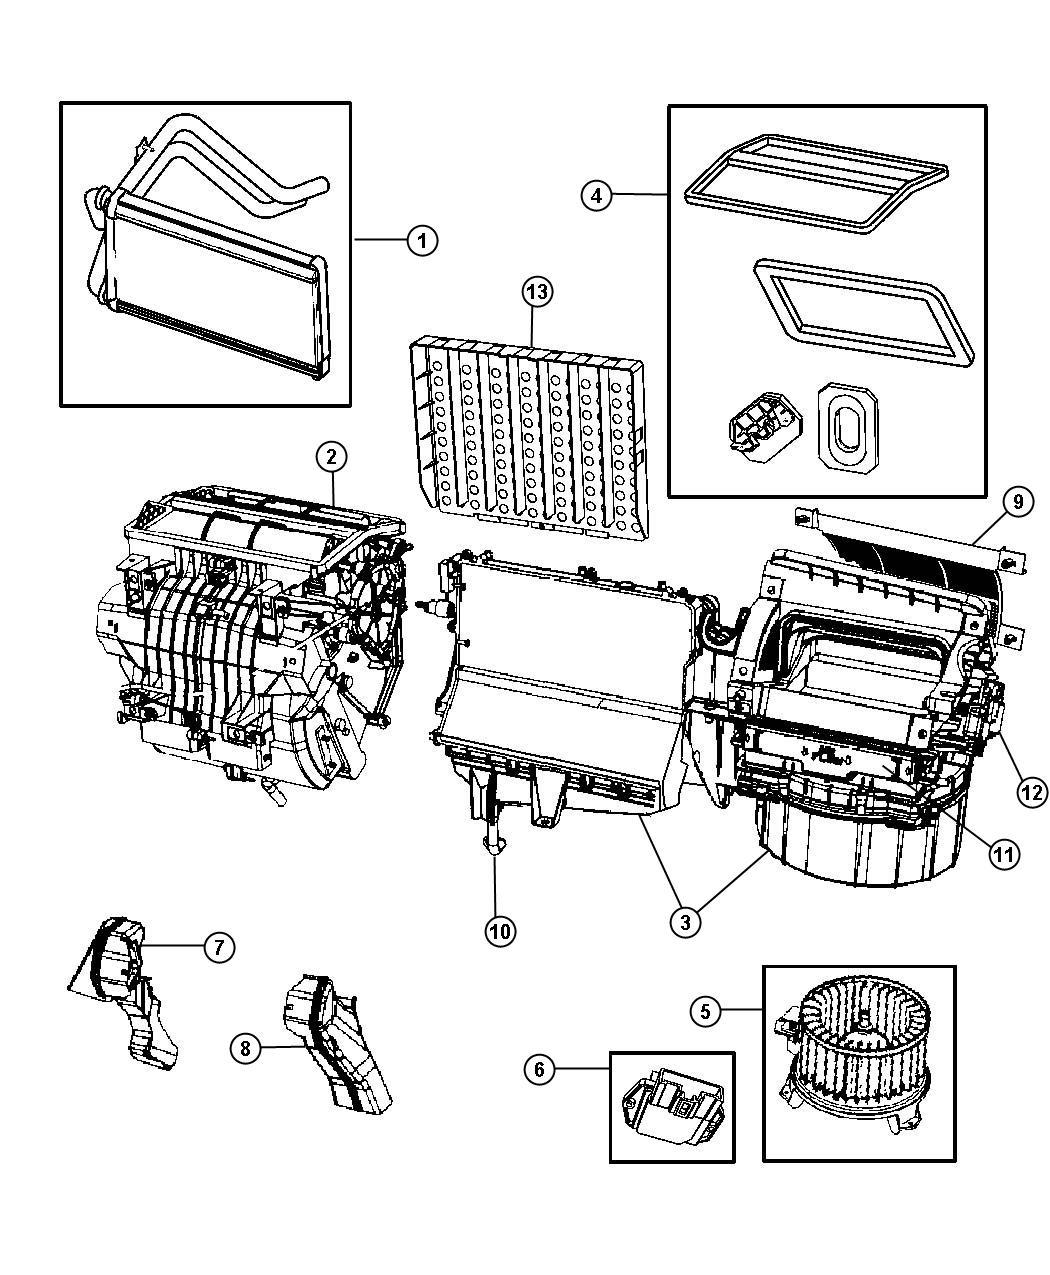 Jeep Wrangler Actuator Blend Door A C And Heater Instrument Module Panel